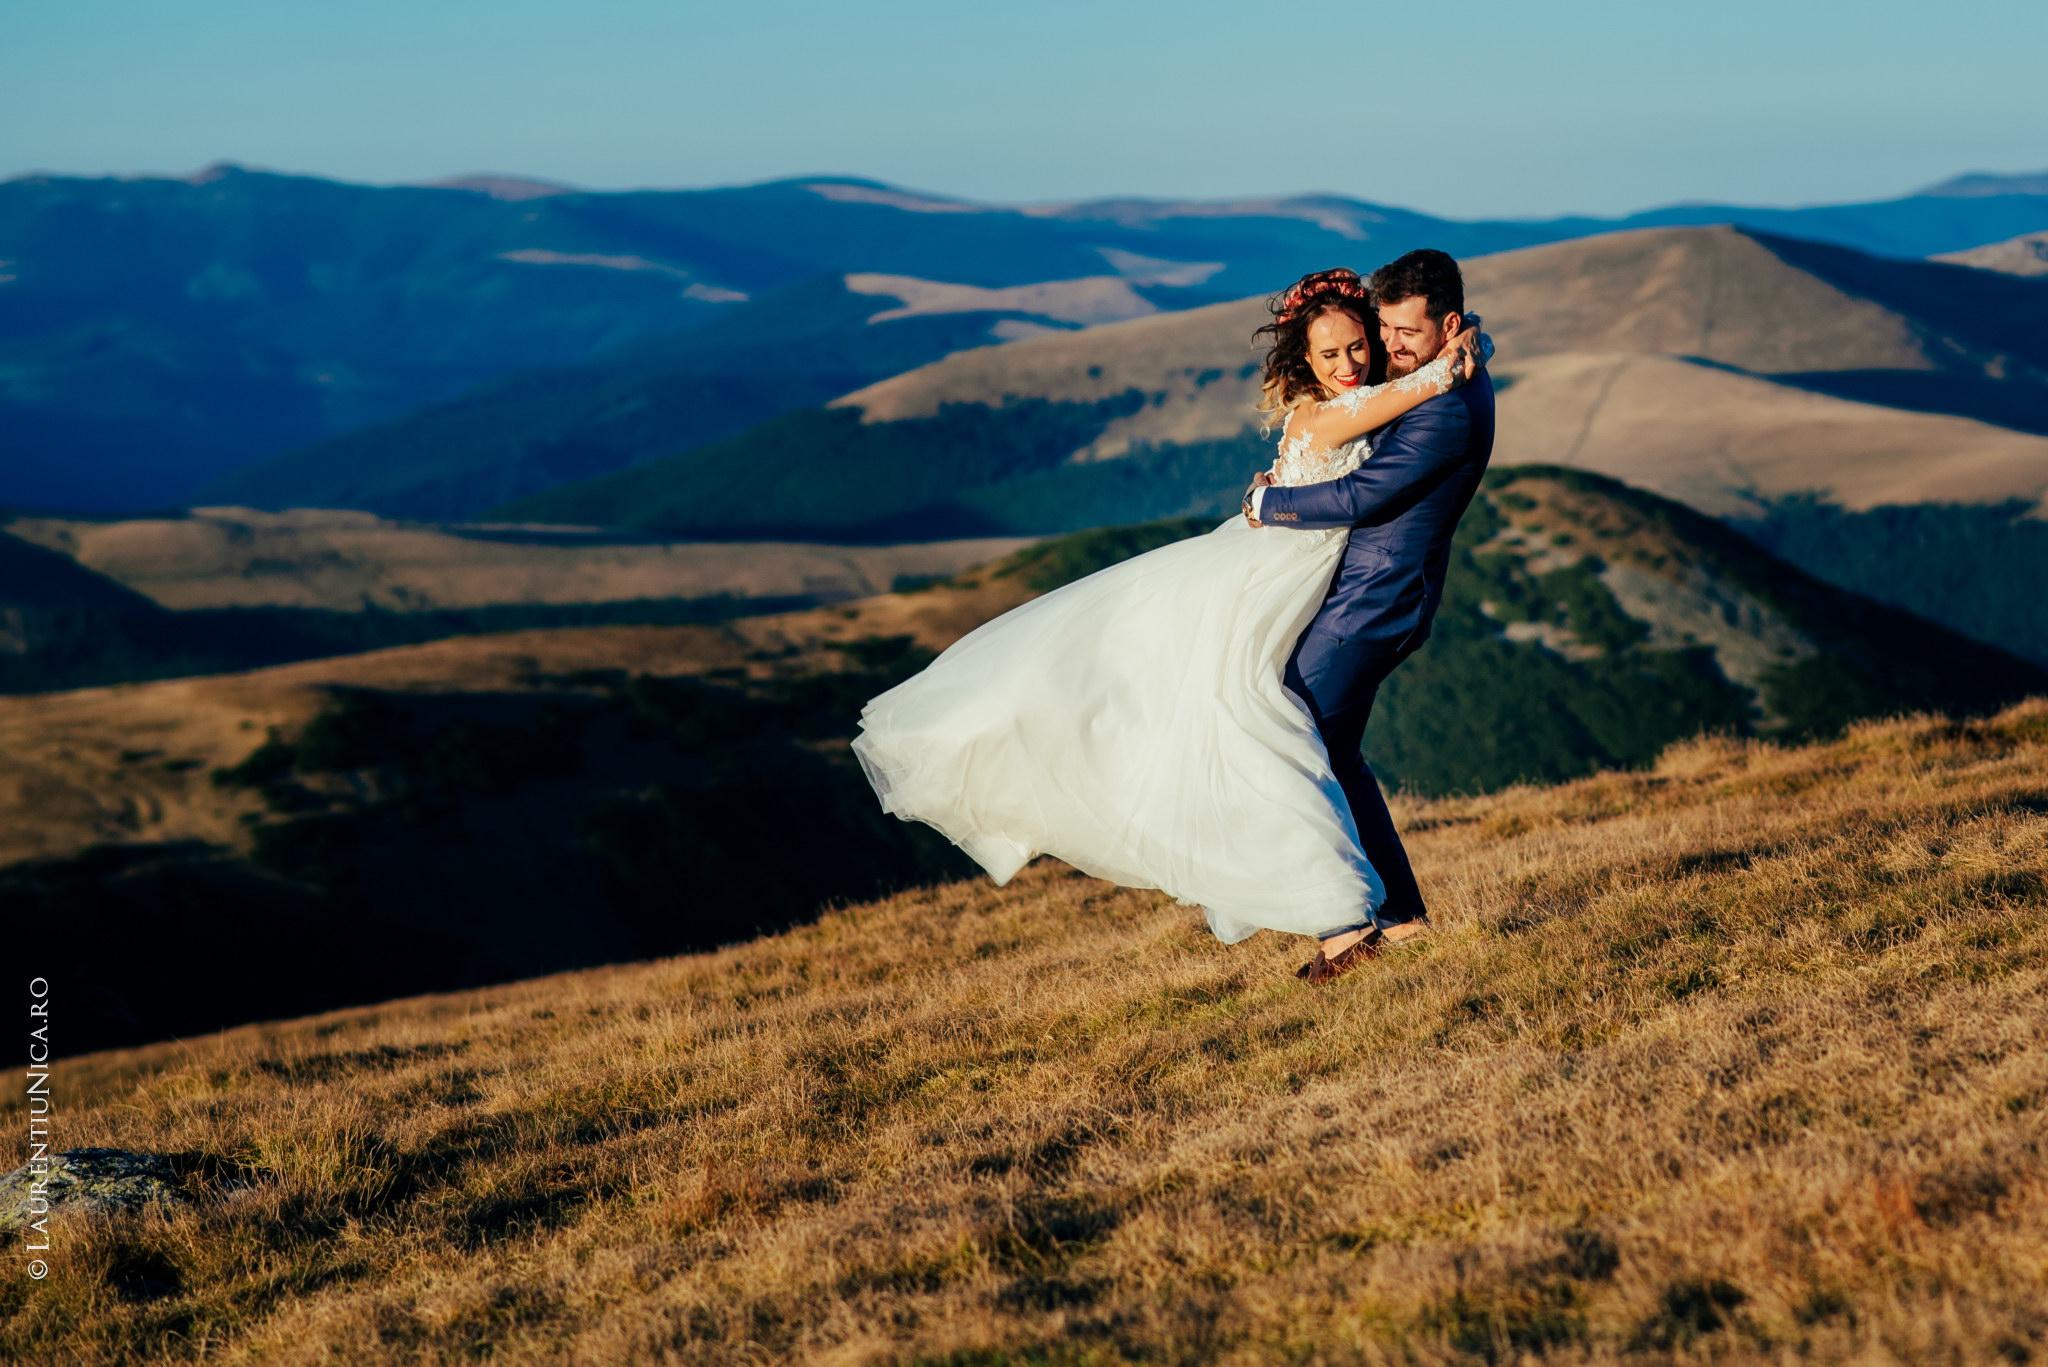 aida si alin fotograf nunta laurentiu nica transalpina 26 - Aida & Alin | Fotografii After Wedding | Transalpina - Muntii Parang